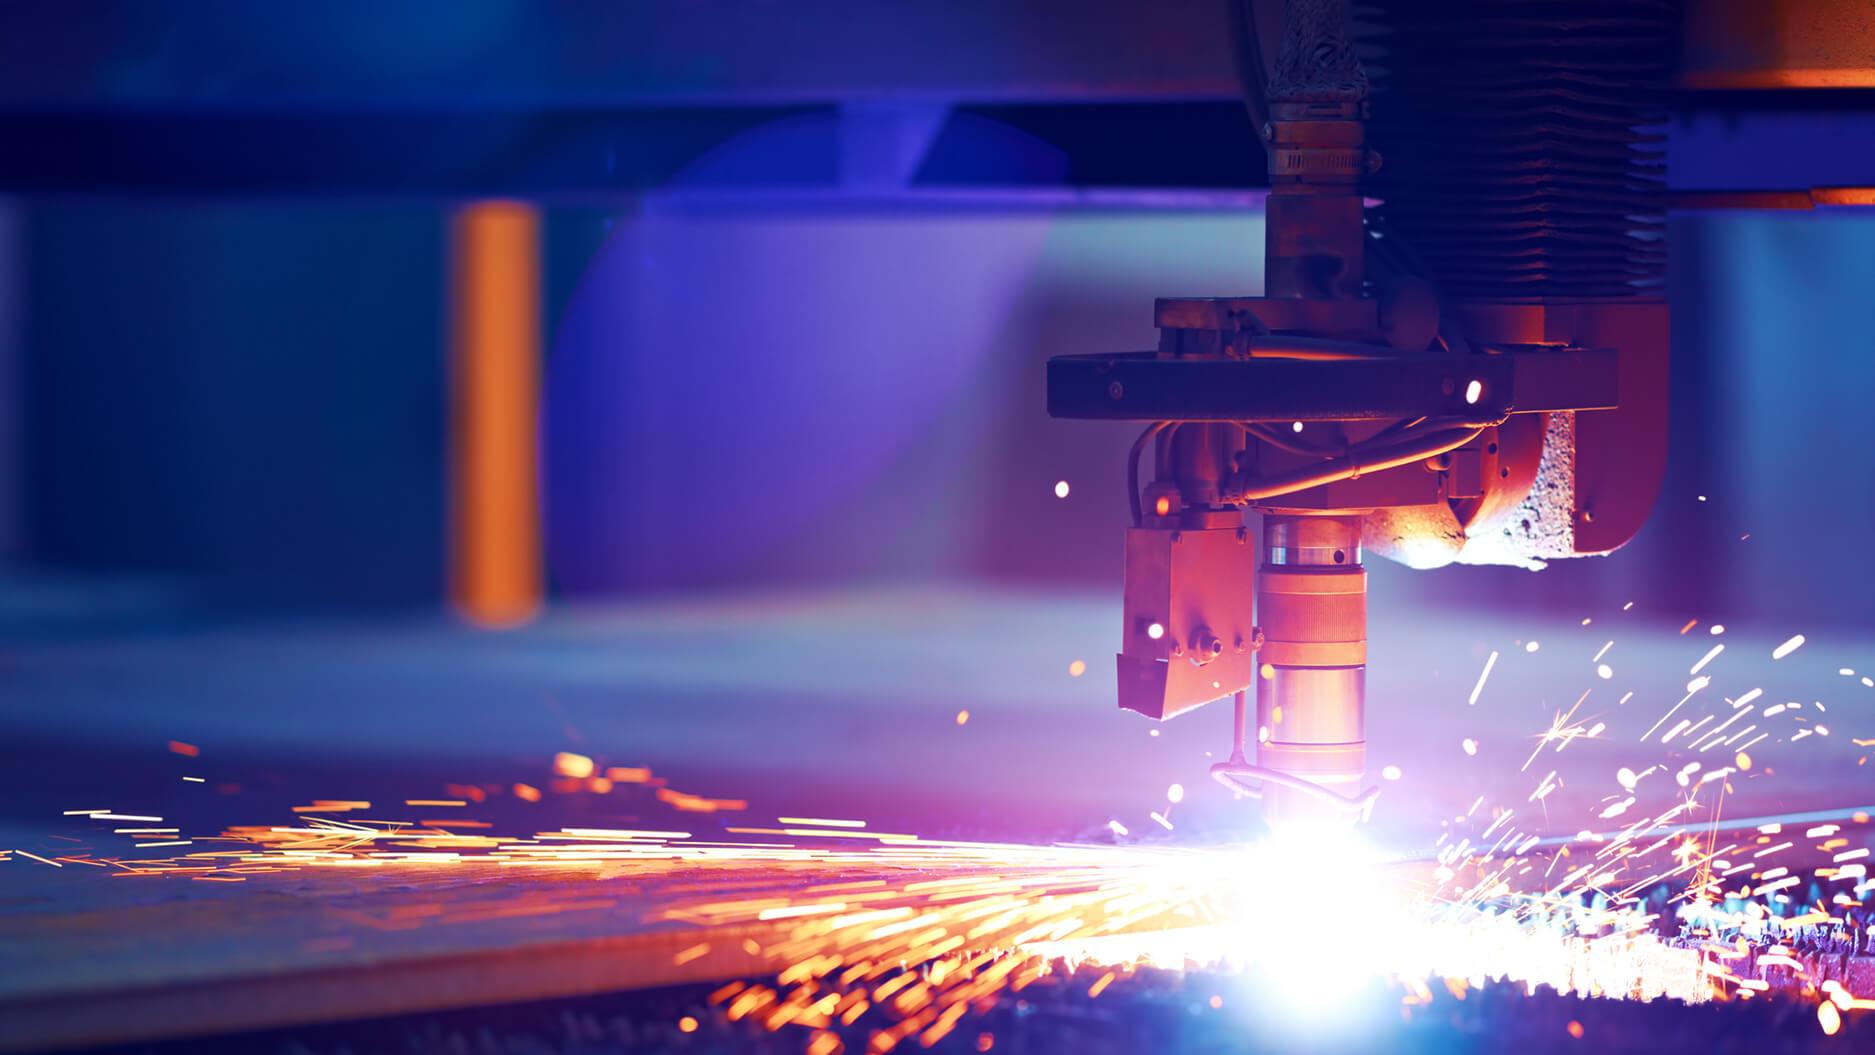 Machine-cutting-metal-causing-sparks